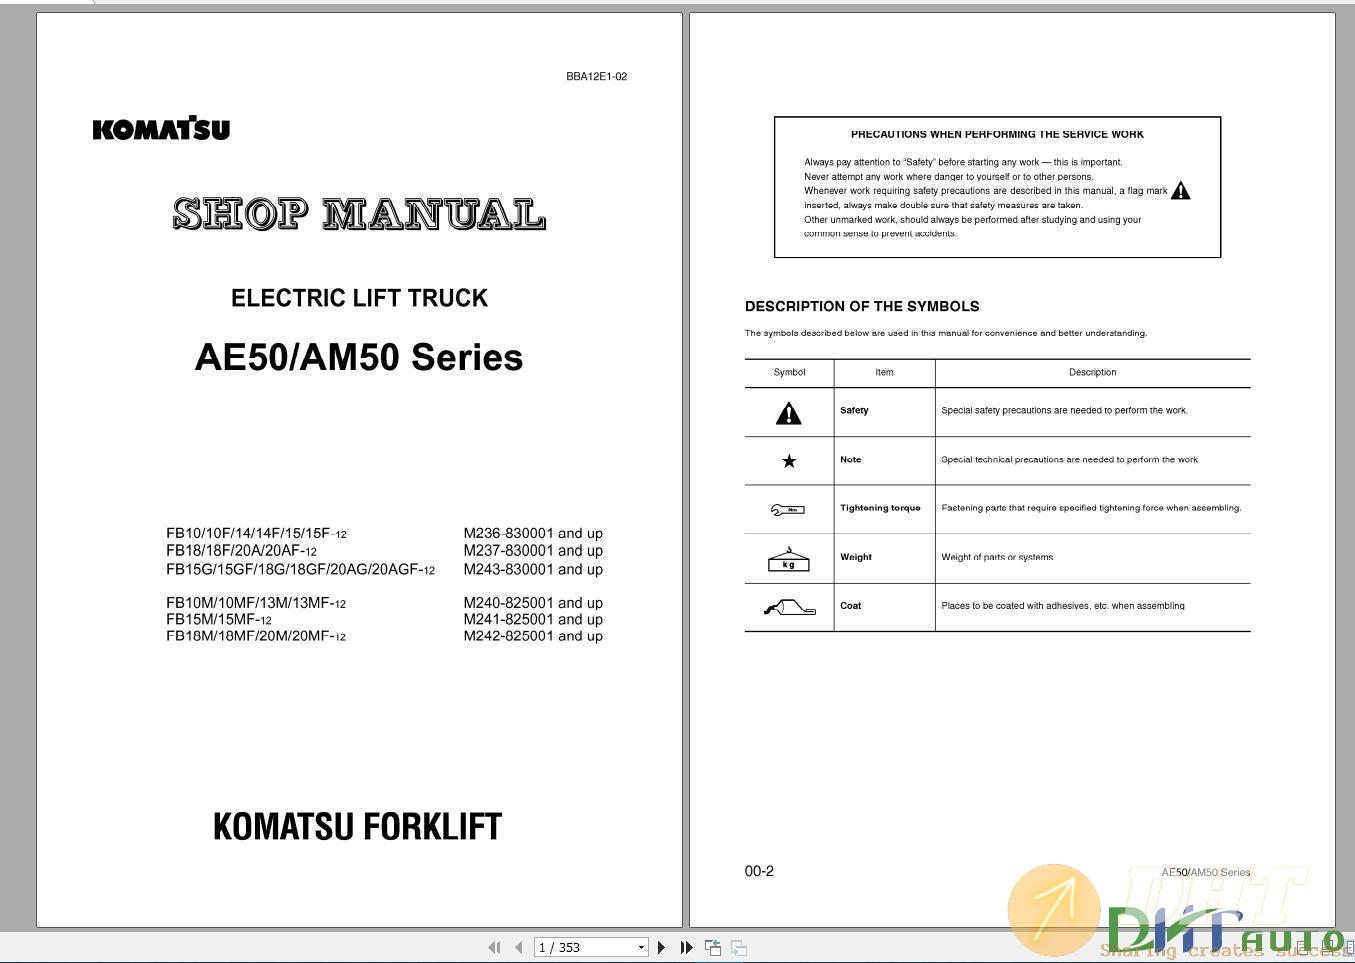 Komatsu-Forklift-Shop-Manual-PDF-Full-3.jpg